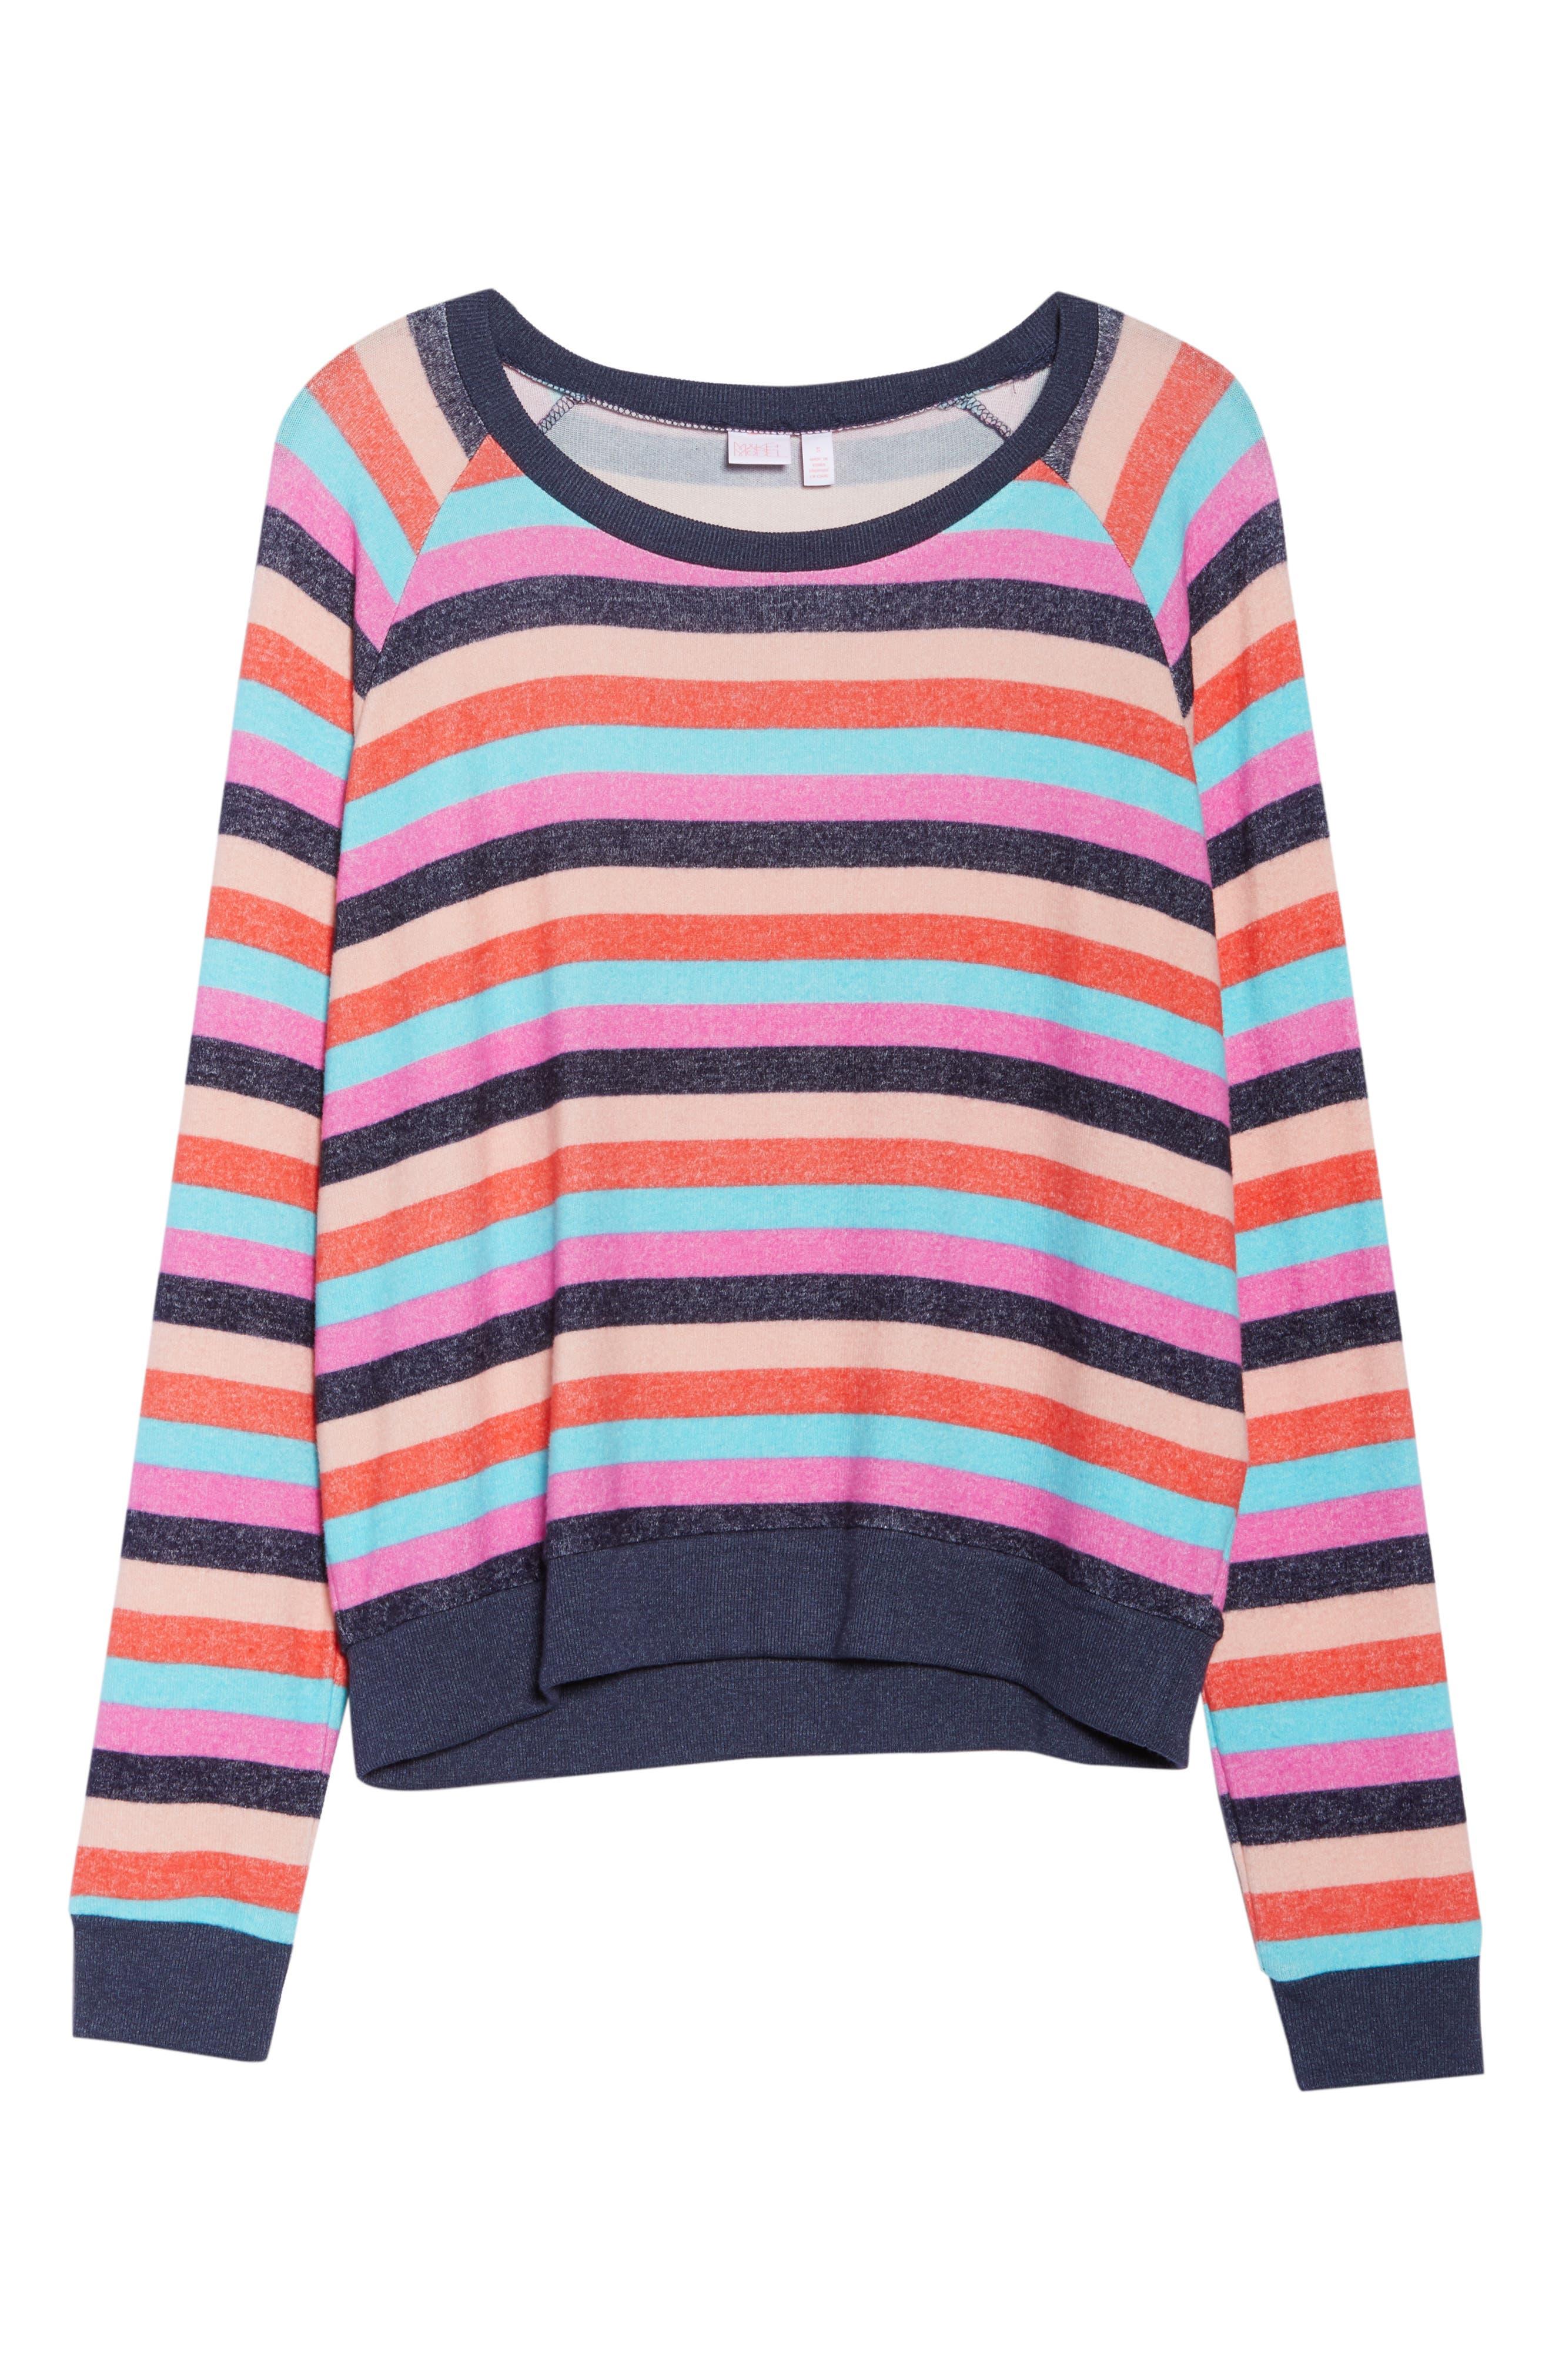 Cozy Crew Raglan Sweatshirt,                             Alternate thumbnail 6, color,                             Navy Dusk Milli Multi Stripe